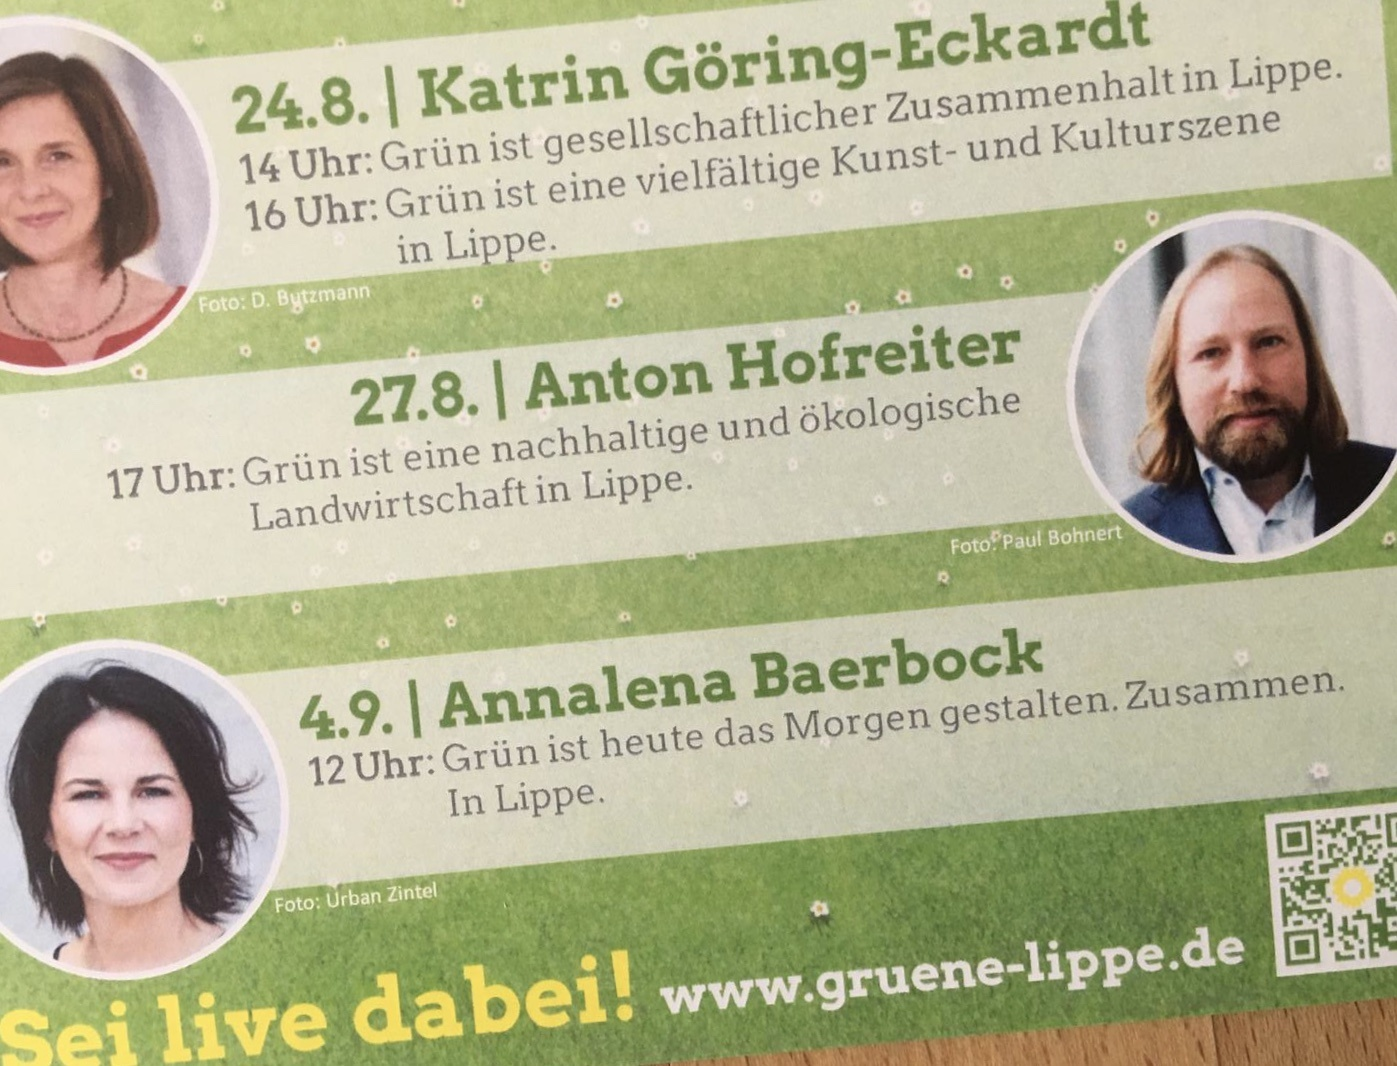 Ankündigung 24.8. Katrin Göring-Eckardt 27.8. Anton Hofreiter 4.9. Annalena Baerbock